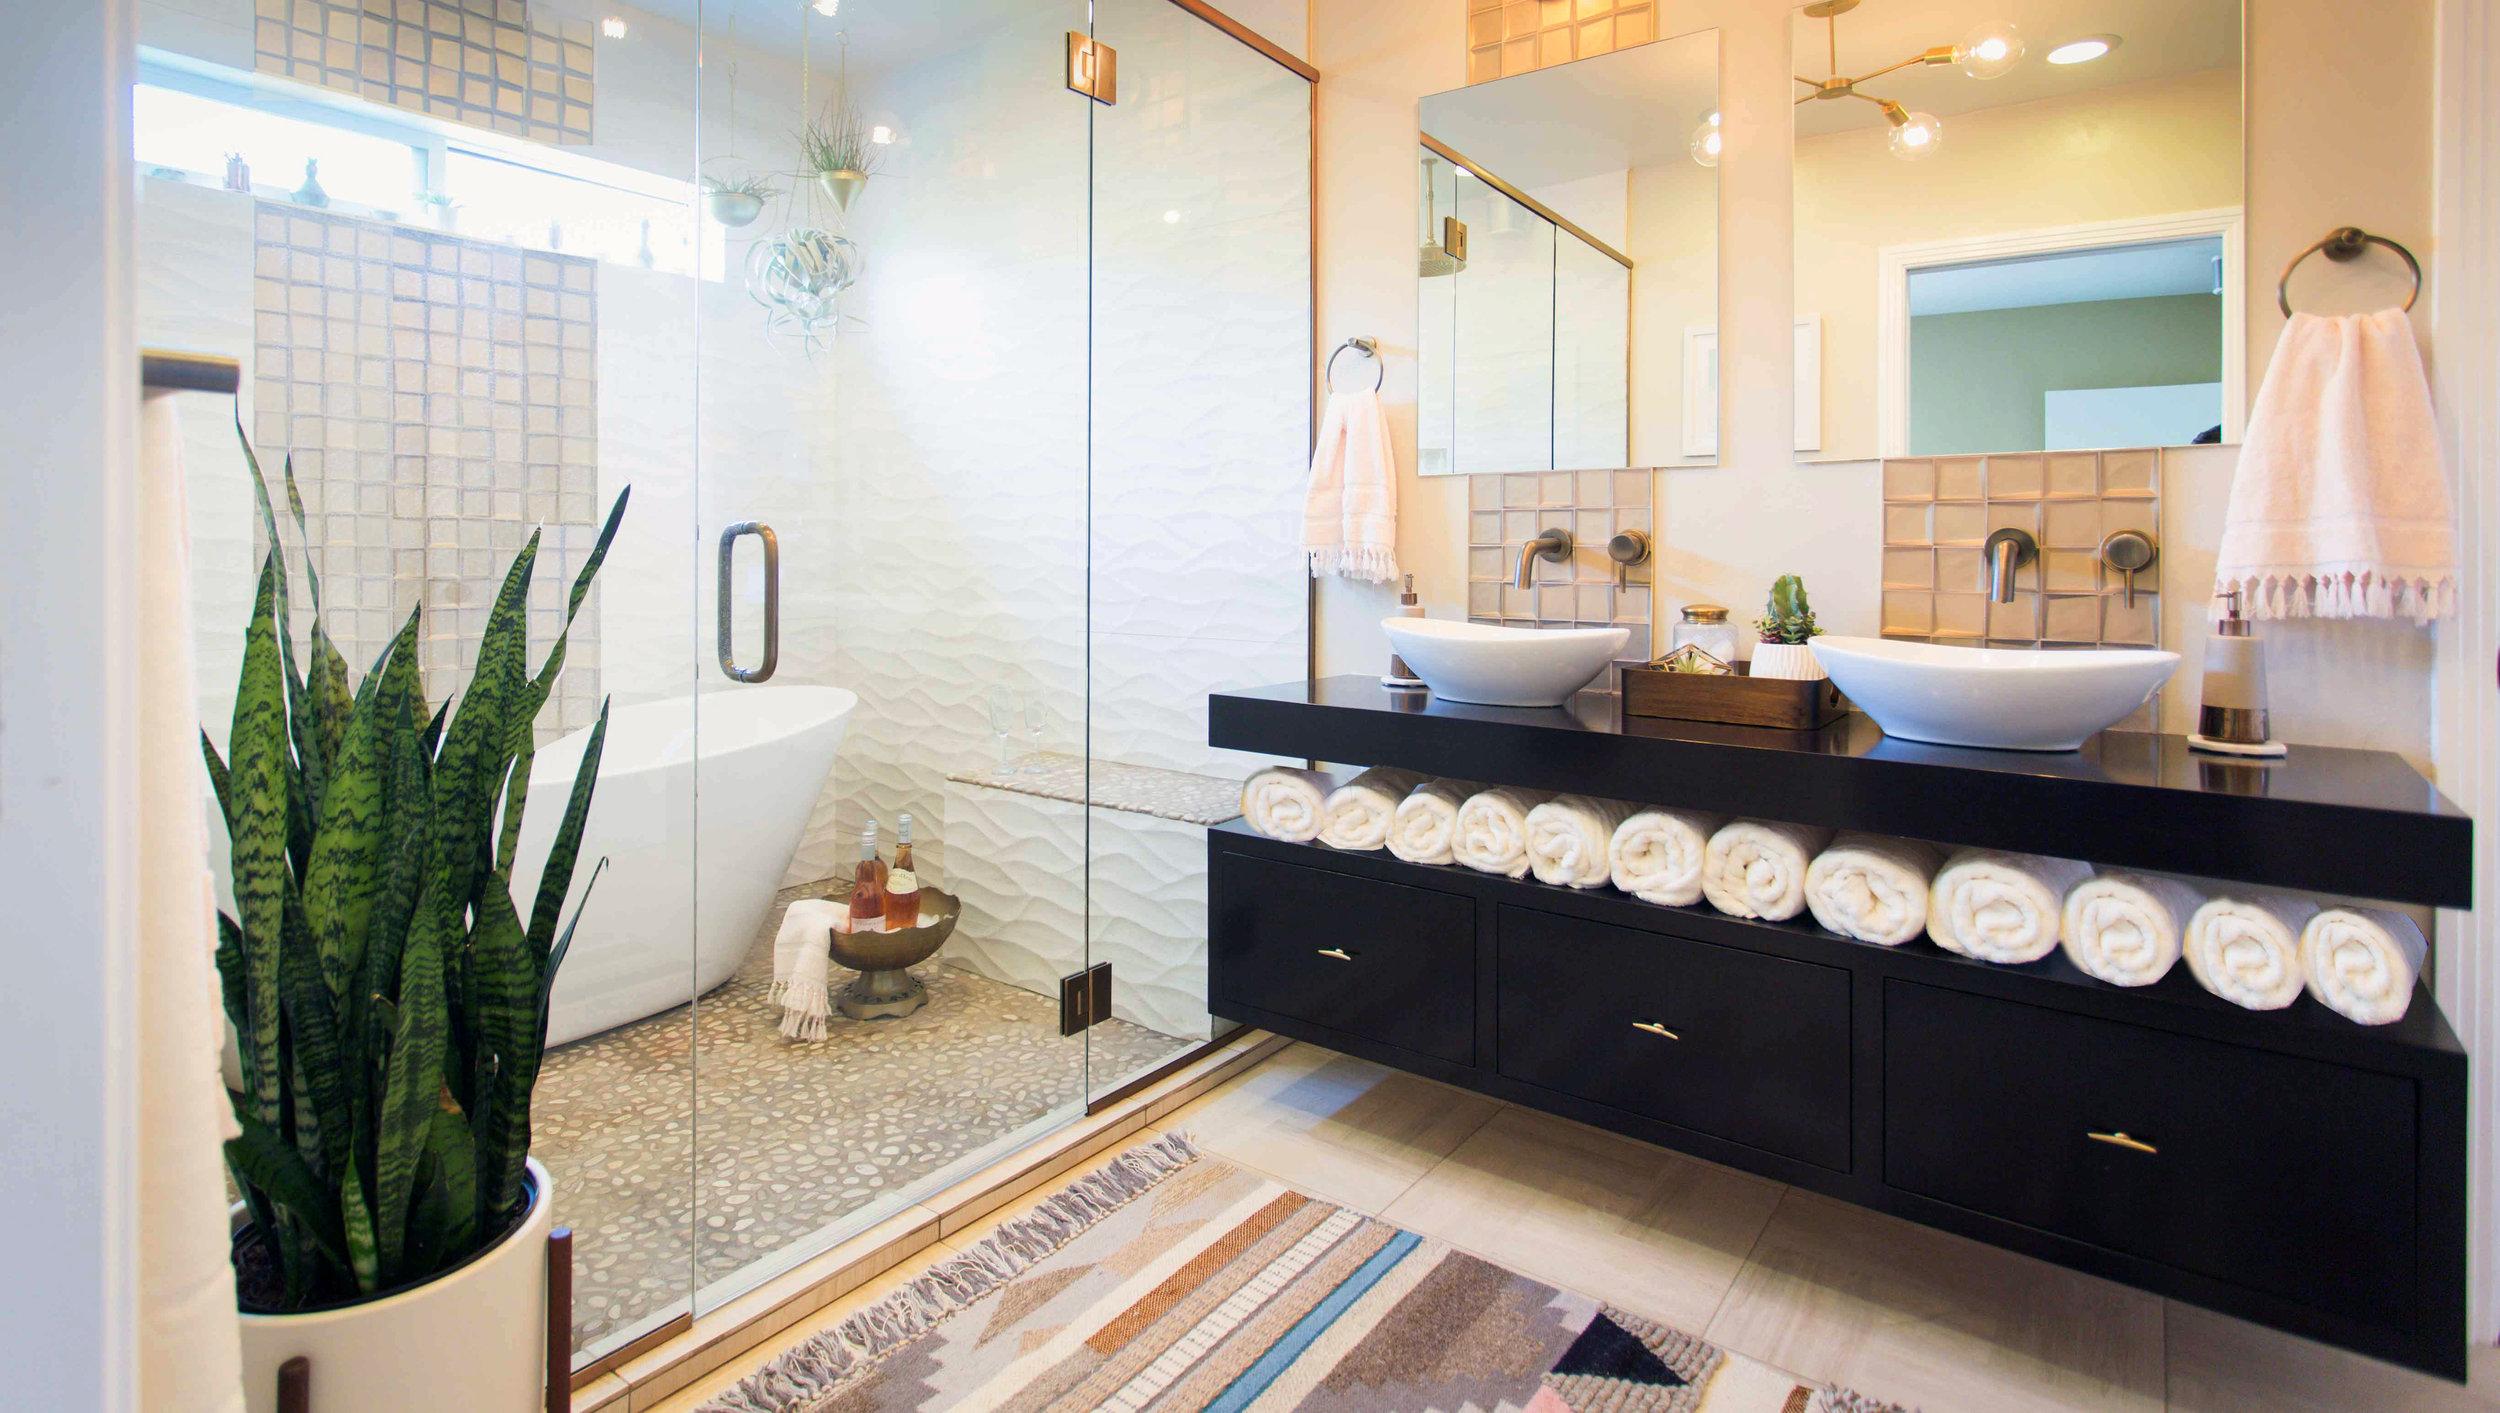 Hope Pinc Design Point Loma Bathroom - Web Images-7709.jpg